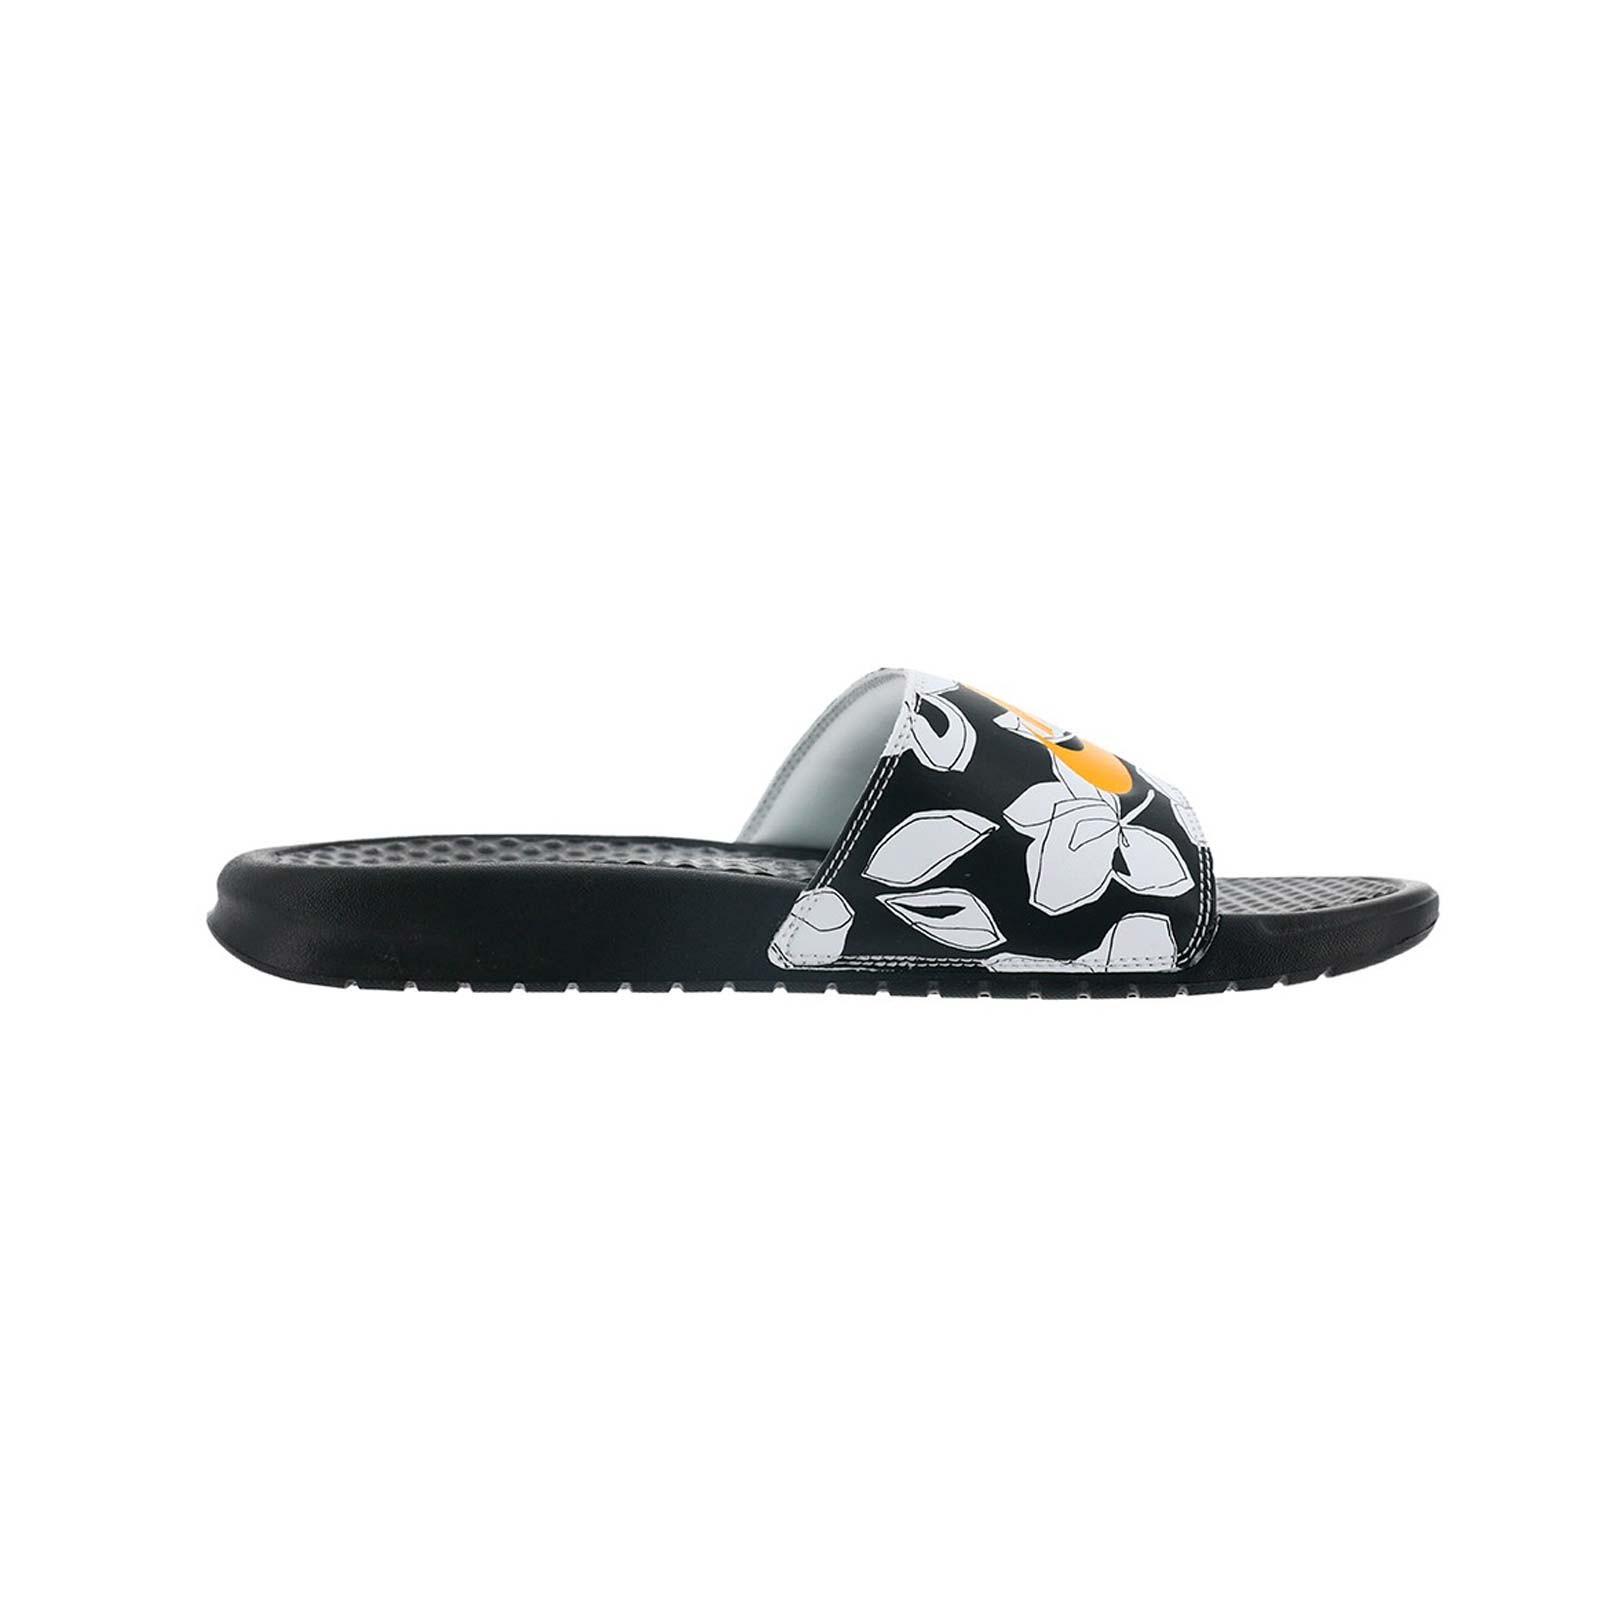 Sandalias Nike Benassi Jdi Print Sportswear para Hombre